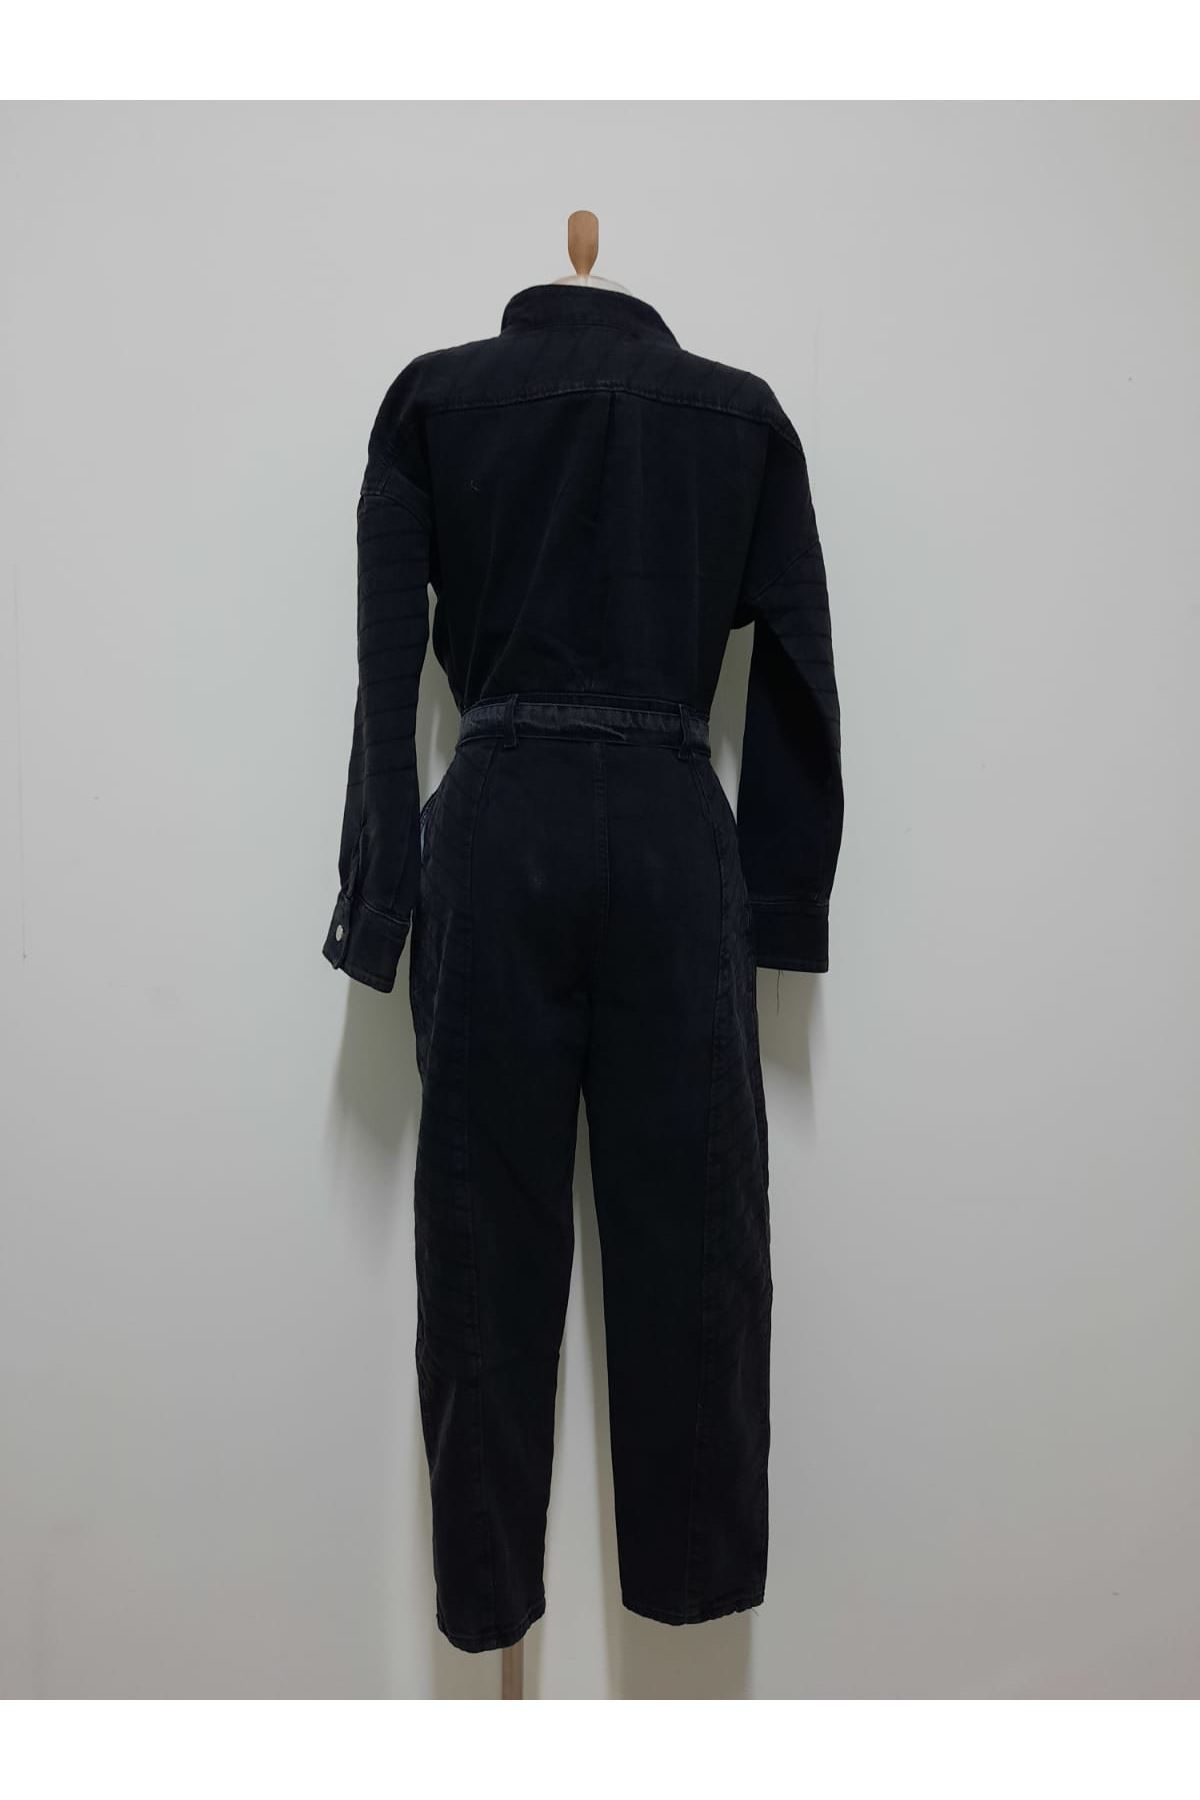 Yaka Detaylı Kravuze Kot Tulum - siyah